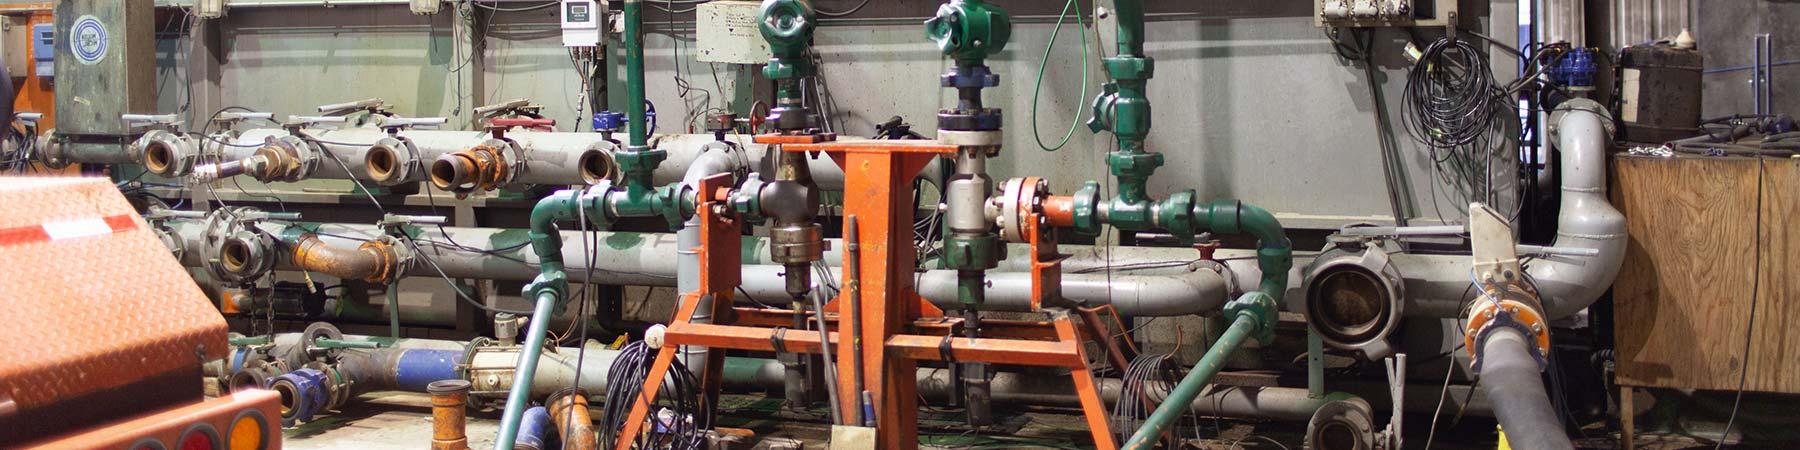 fleet service of tulsa oilfield test pit control